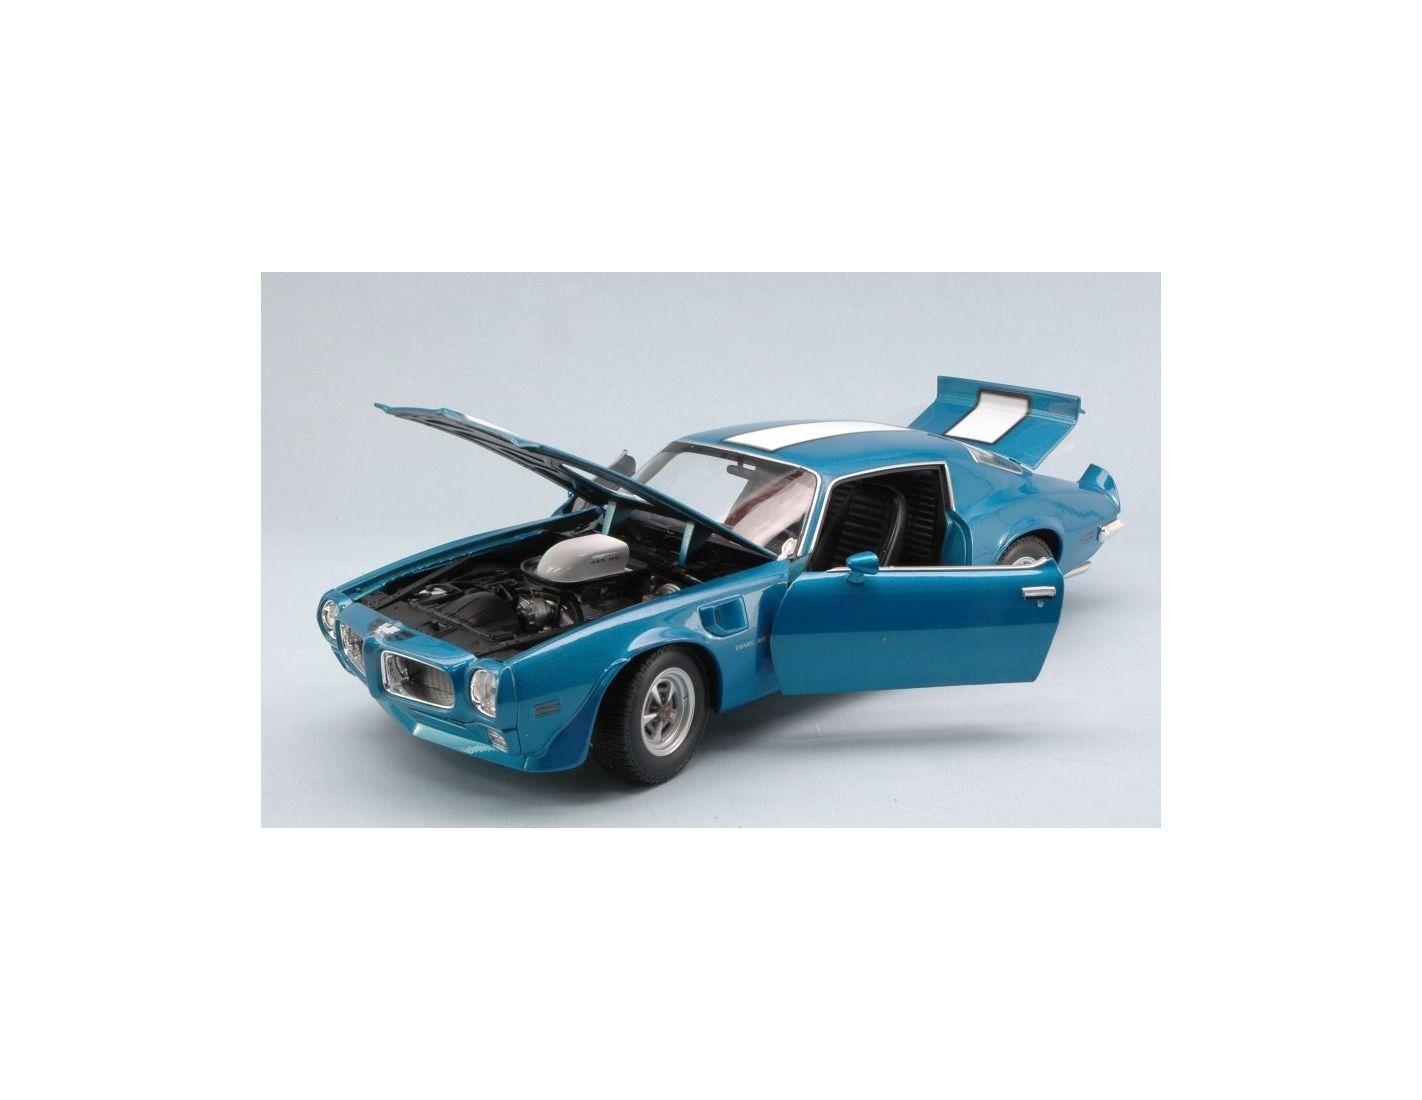 Welly WE2566BL PONTIAC FIREBIRD TRANS AM 1972 azul W blancoo STRIPES 1 18 Modellin